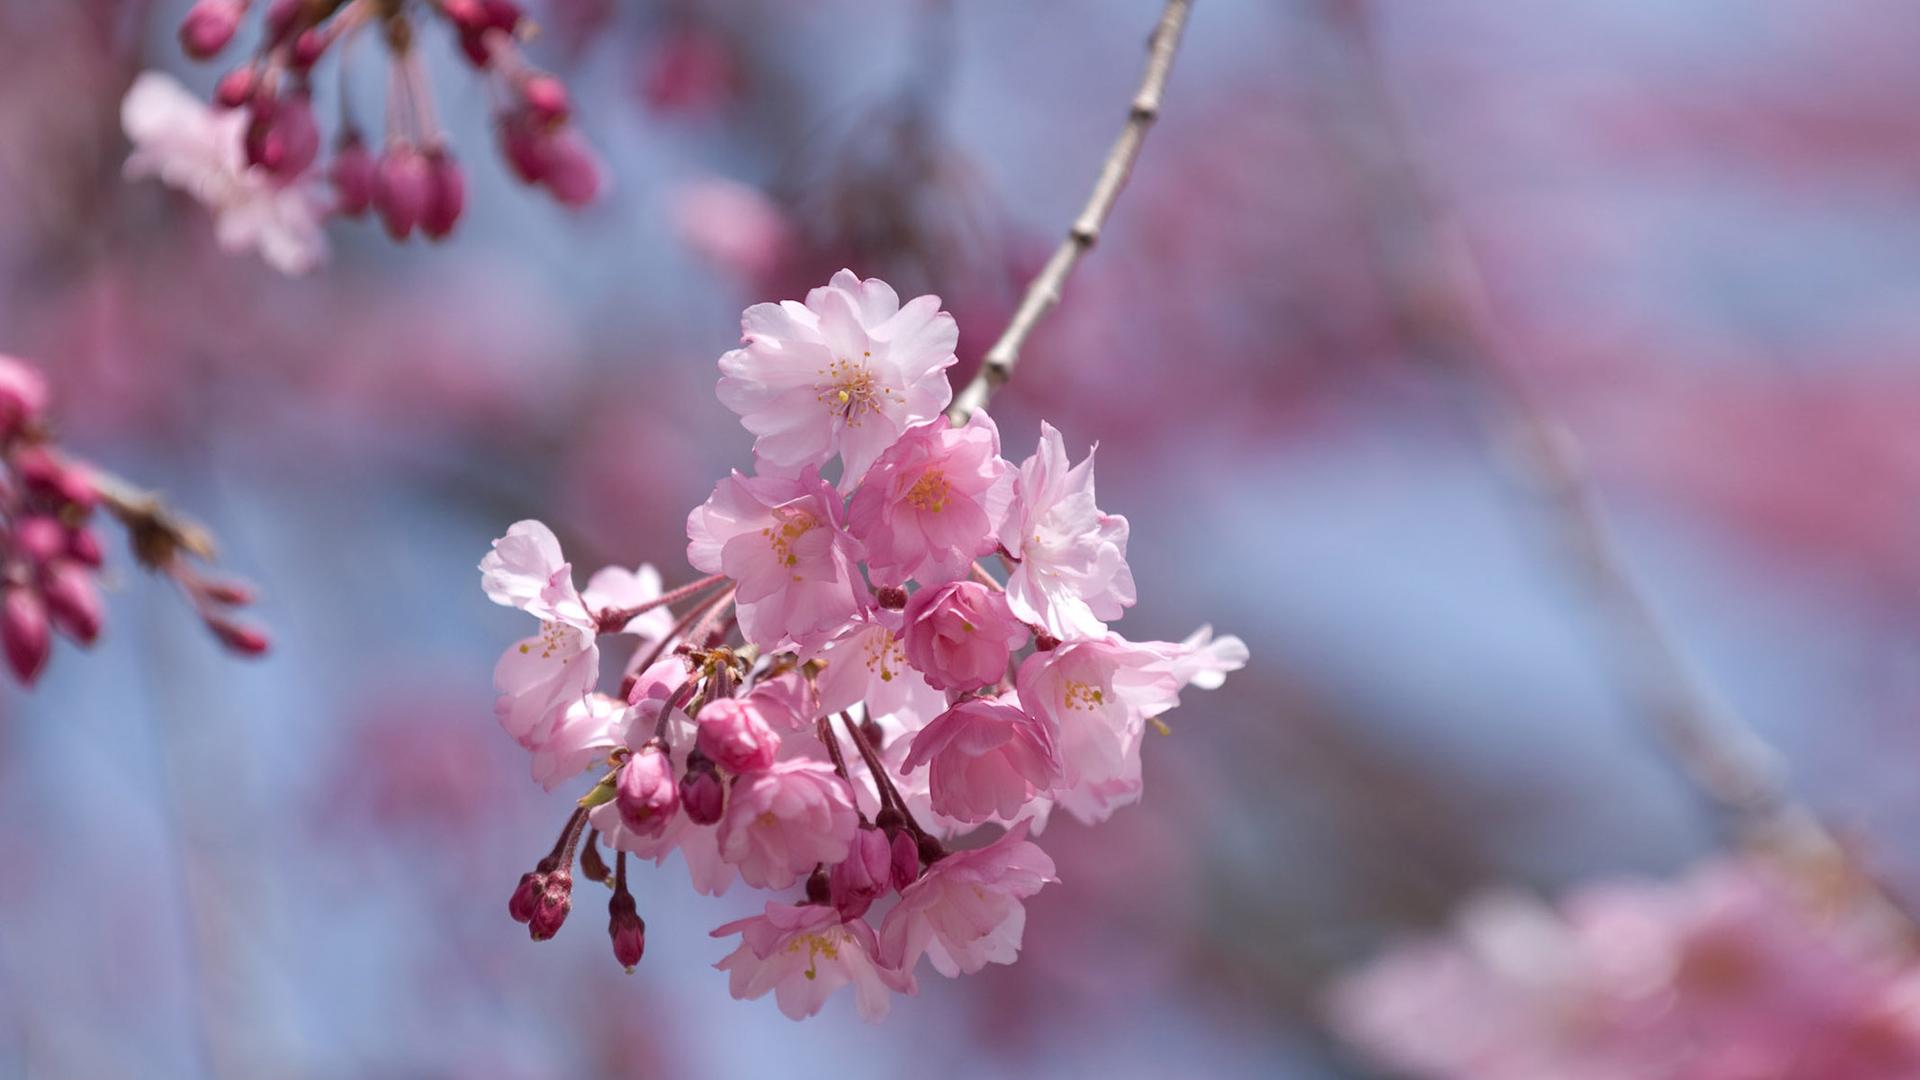 Flowers Full HD Wallpapers Download 1080P Desktop 1920x1080